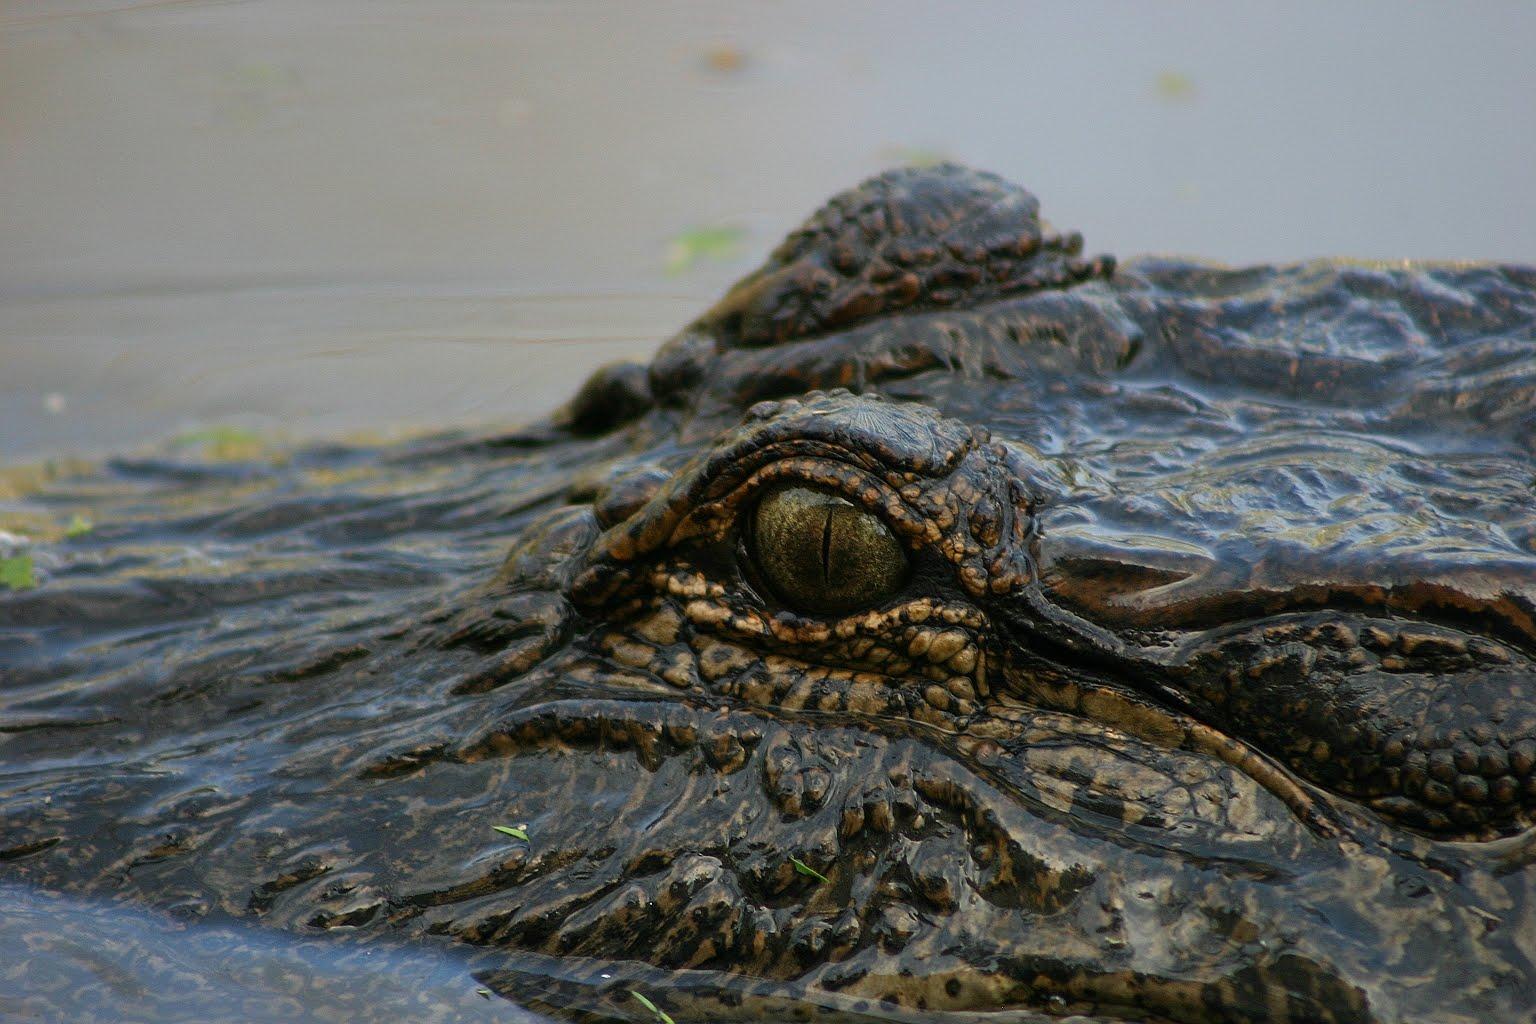 http://1.bp.blogspot.com/_Di8Yr6VhwU0/S8o7u-F1GcI/AAAAAAAAEHQ/g7vyqixXYqo/s1600/Alligator%2Beyes2j.JPG